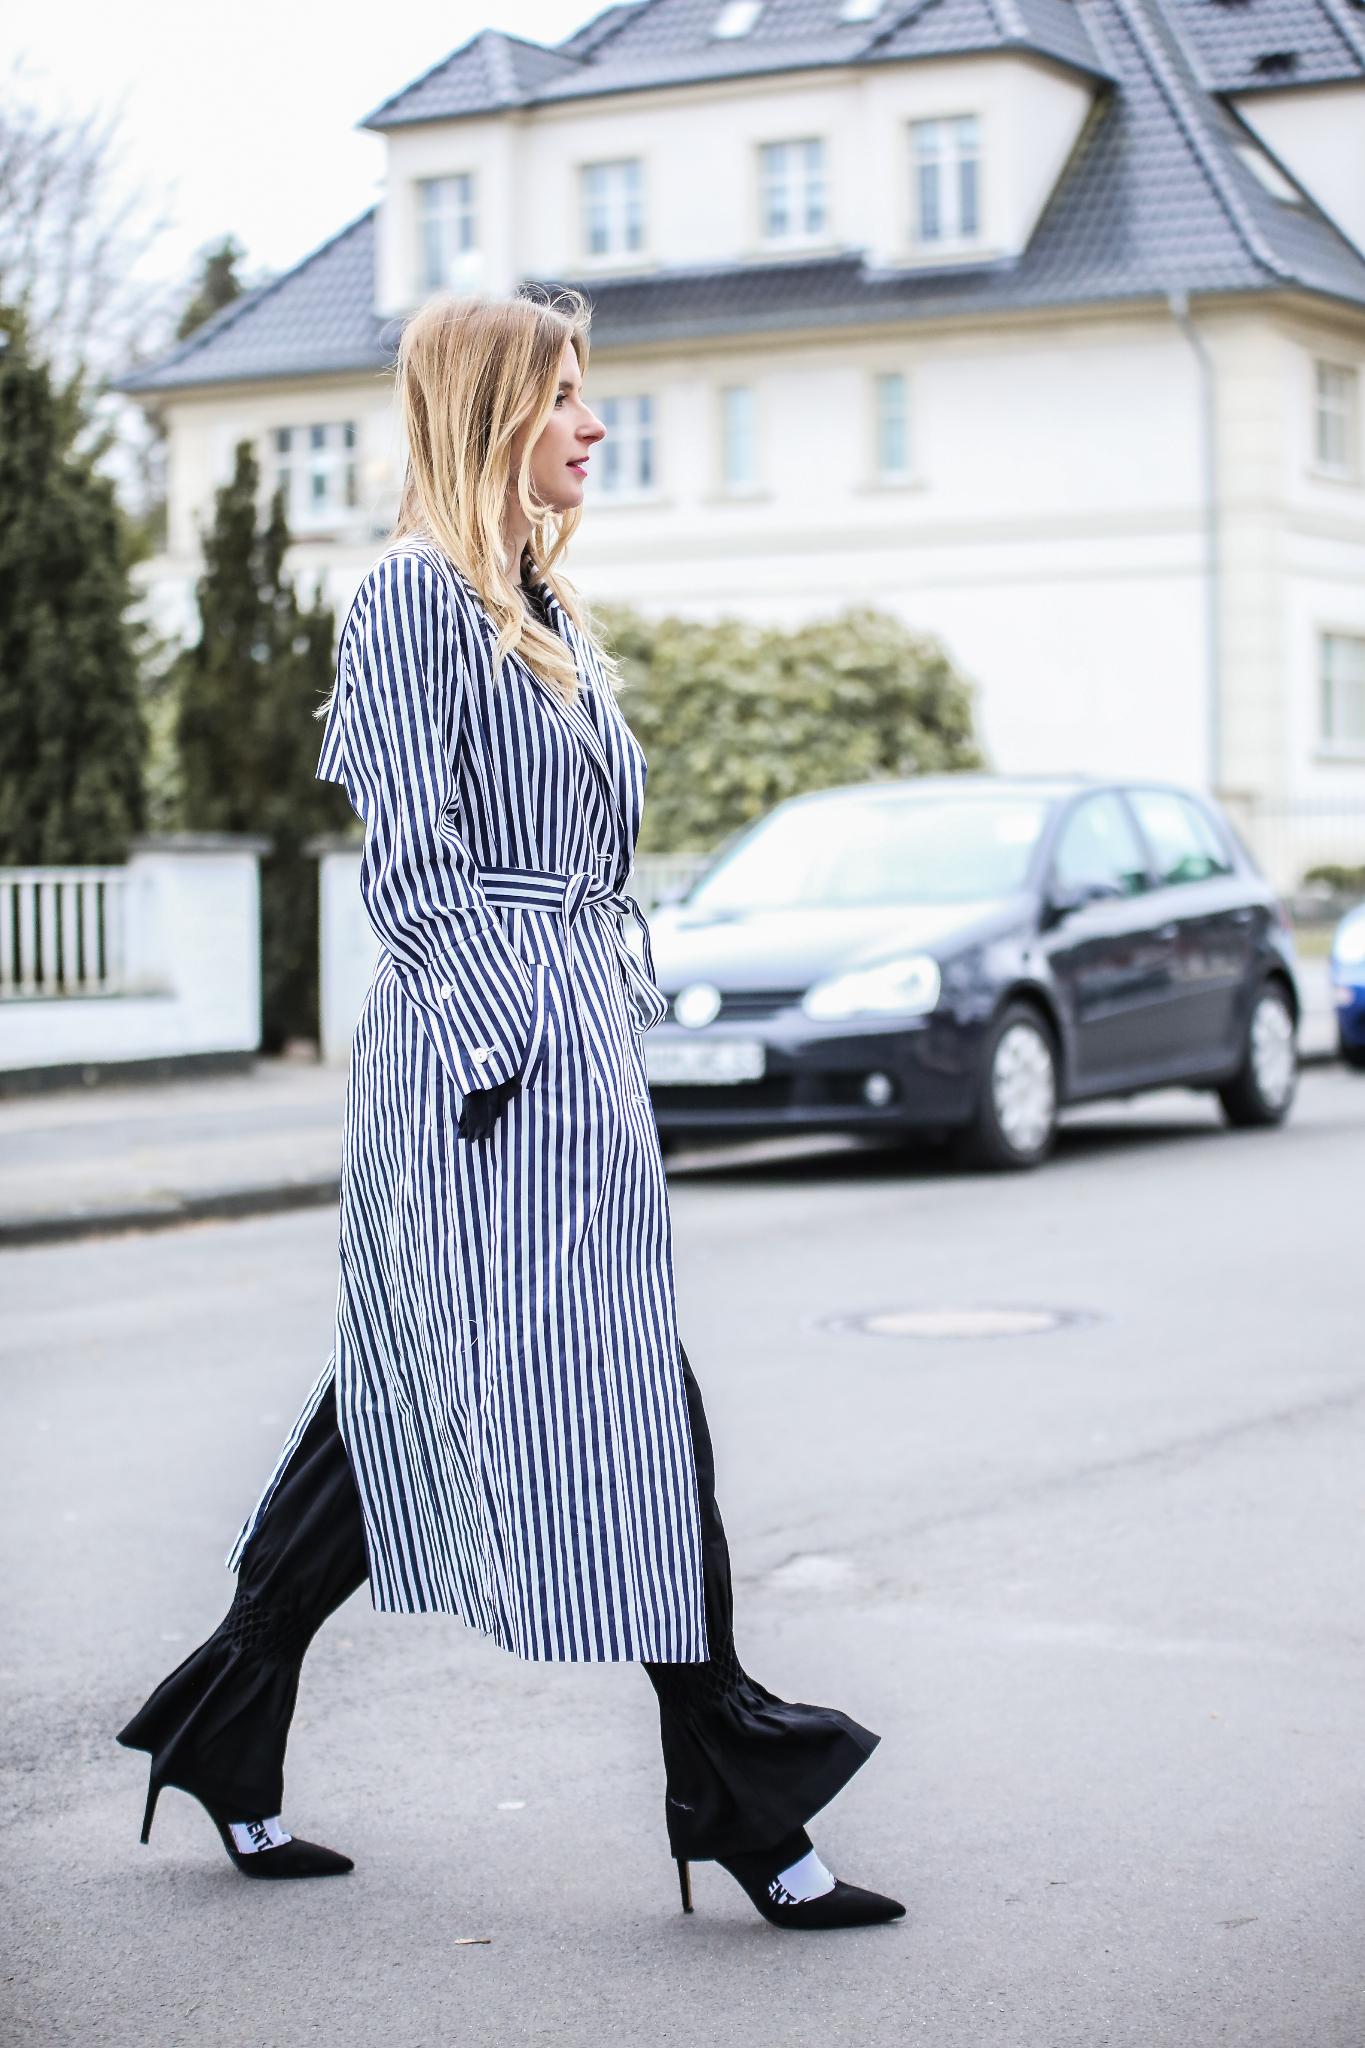 MOD-by-Monique-Fashion-Looks-Striped-Coat-Big-Volants-19